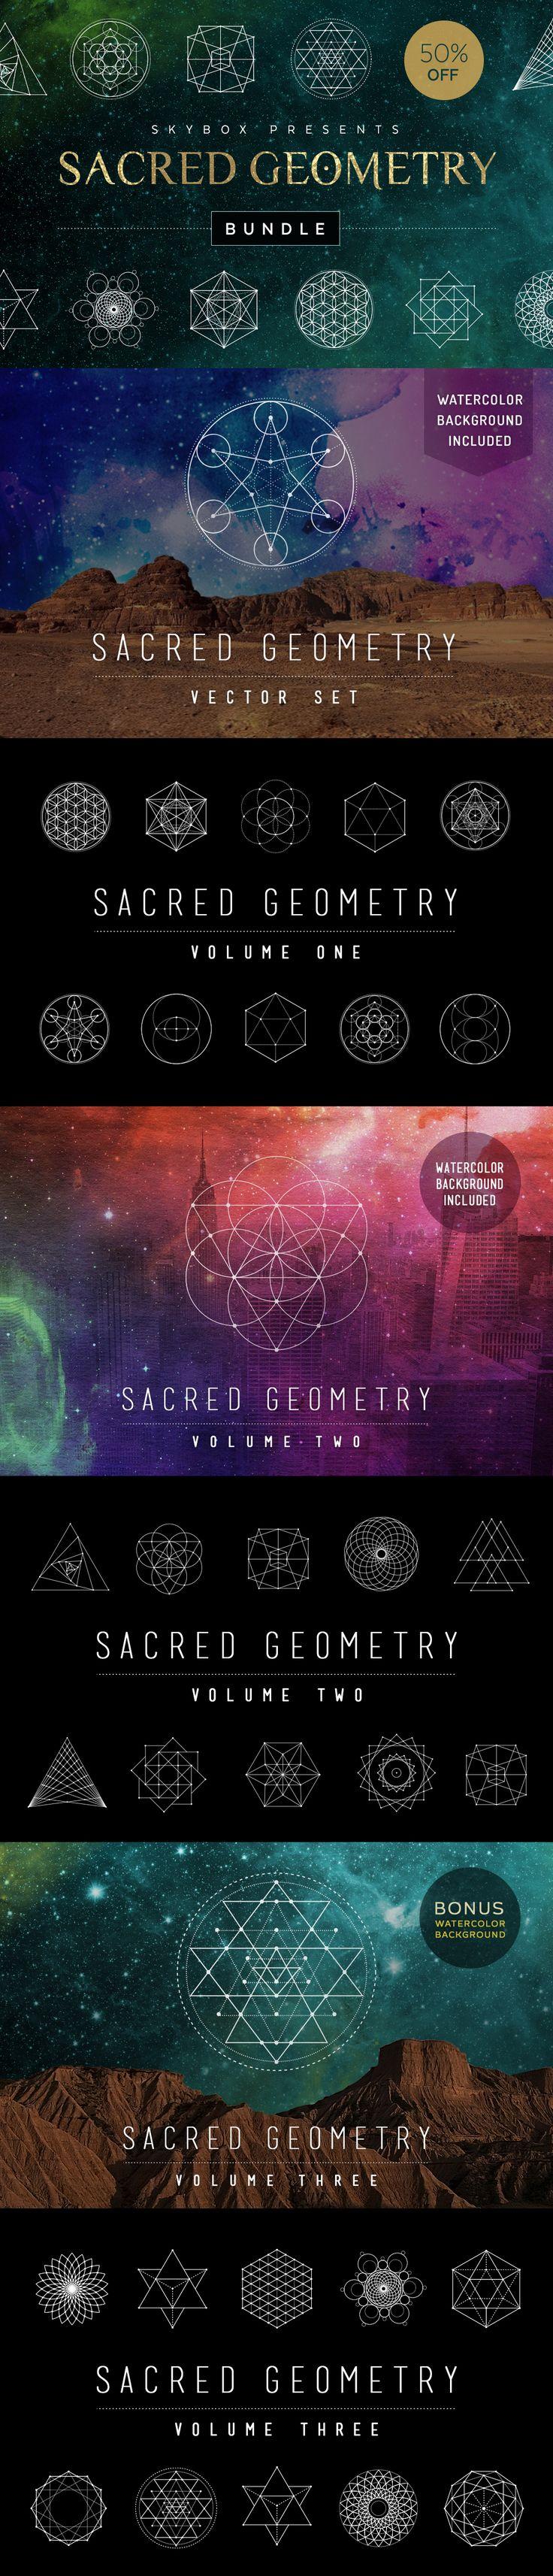 Sacred Geometry Vector Illustration Bundle by Skybox Creative